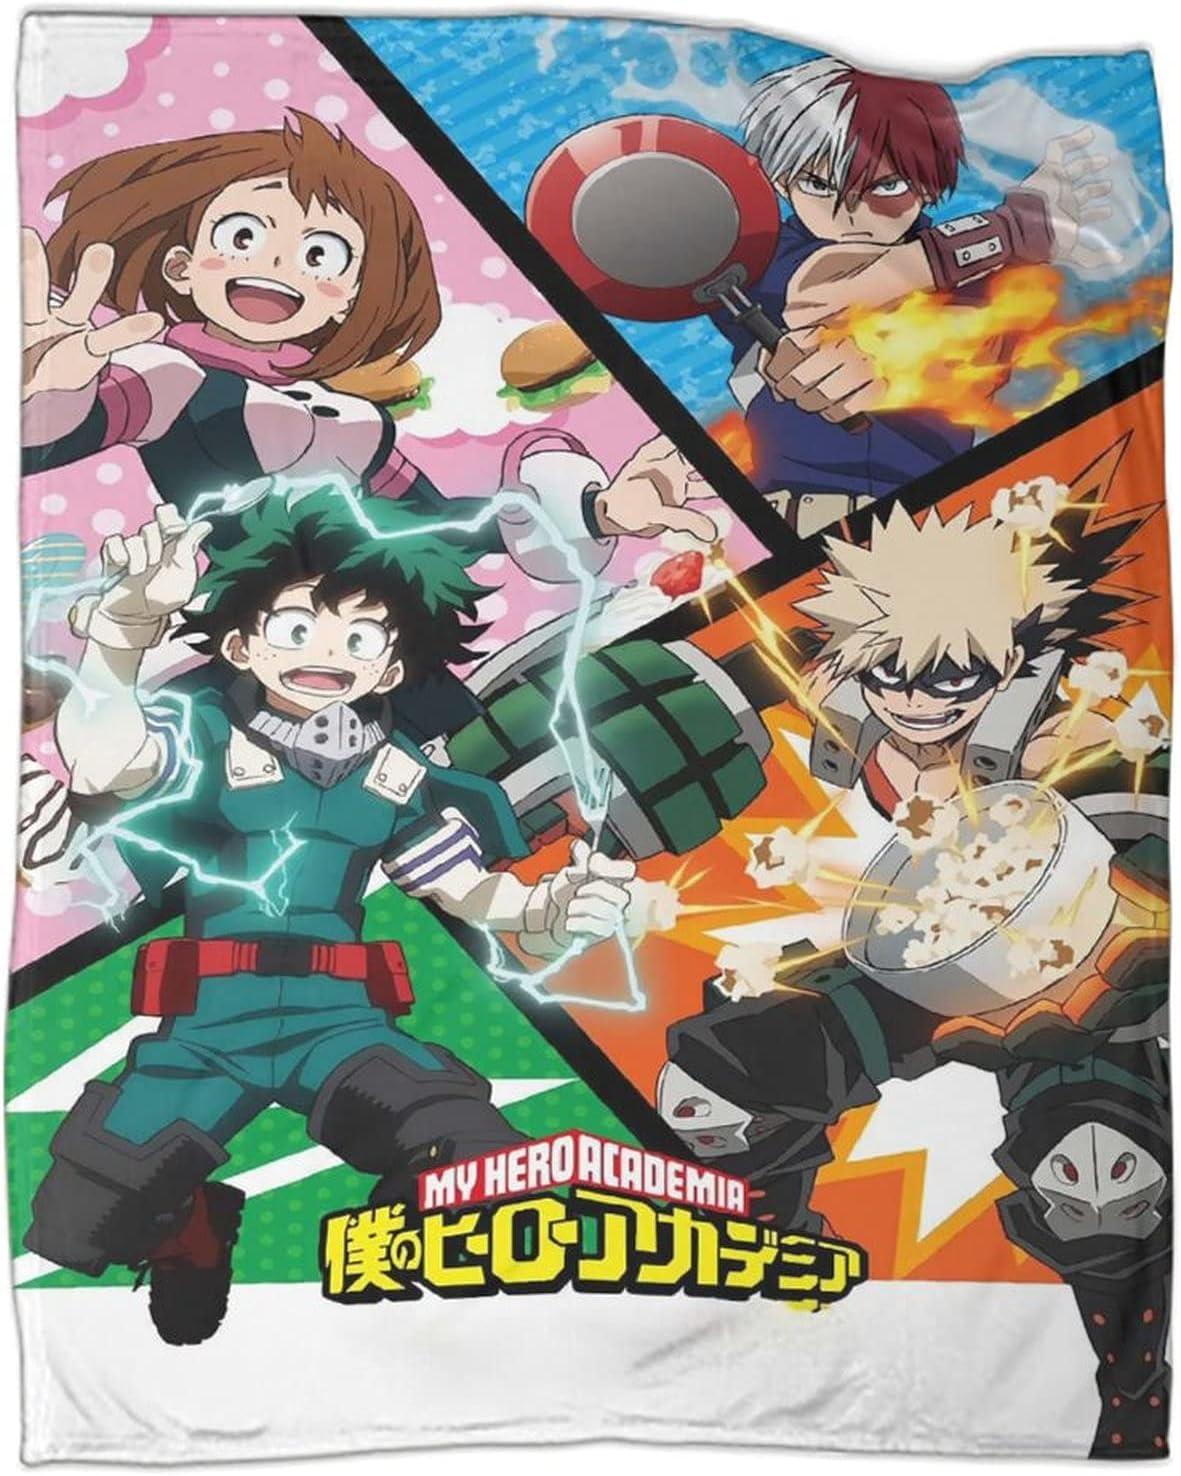 Anime My Hero Academia Deku Katsuki Todor Bakugou Some reservation Uraraka Don't miss the campaign Ochaco